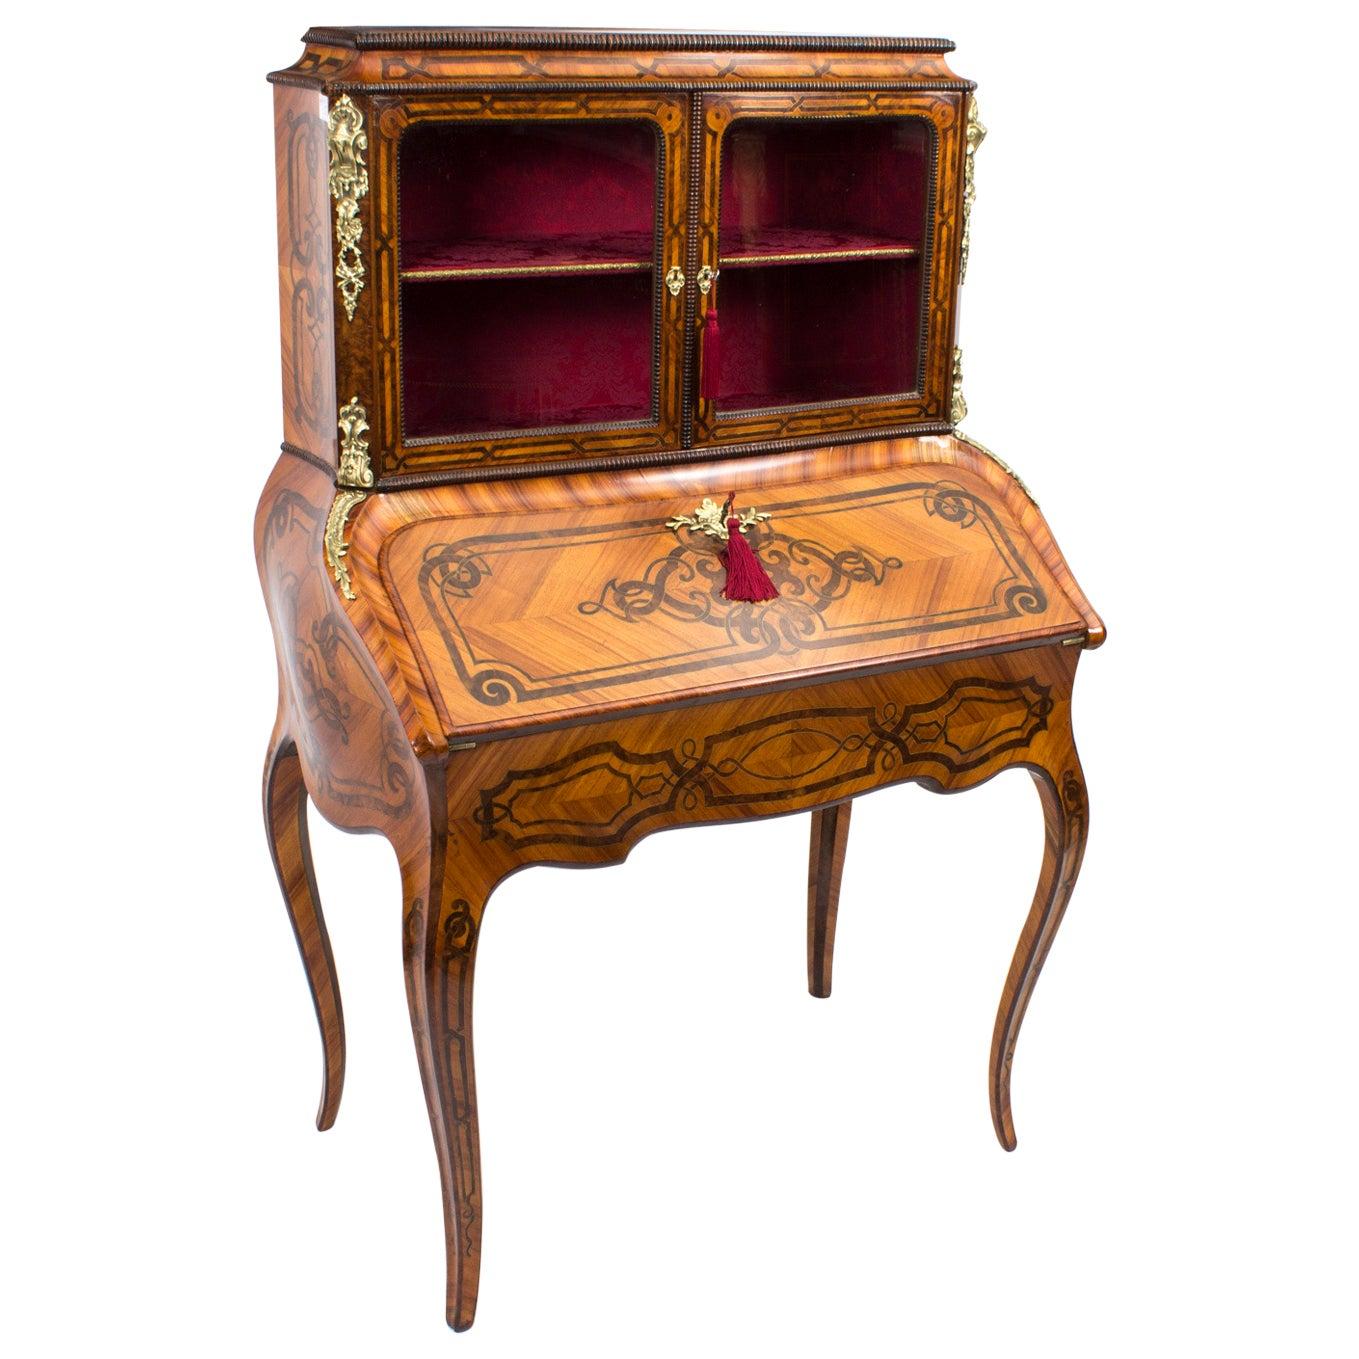 Antique French Marquetry Bonheur du Jour 19th Century